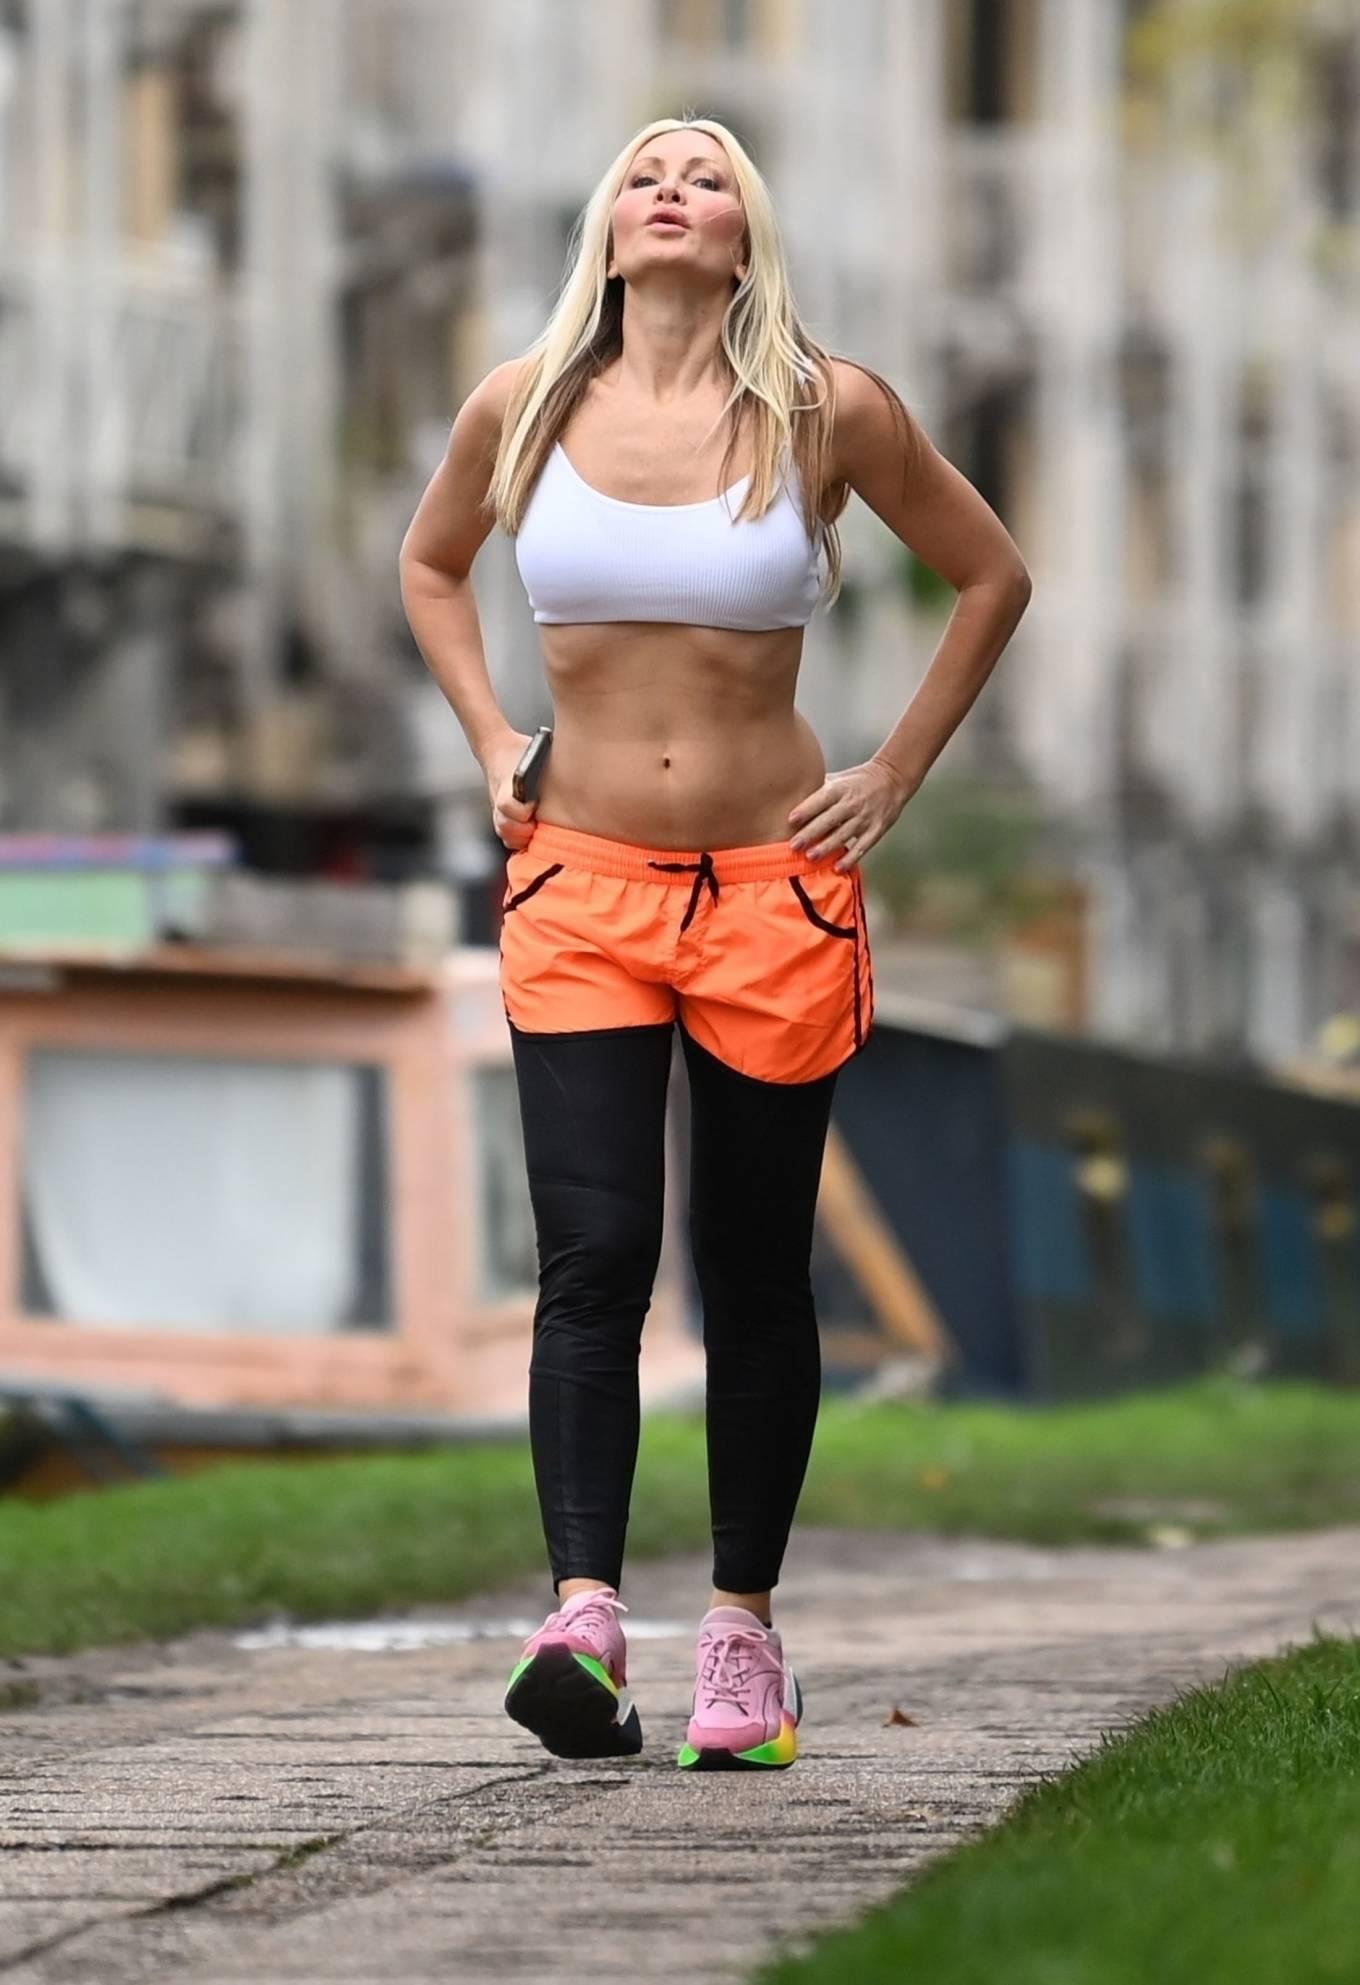 Caprice Bourret - Seen jogging in London